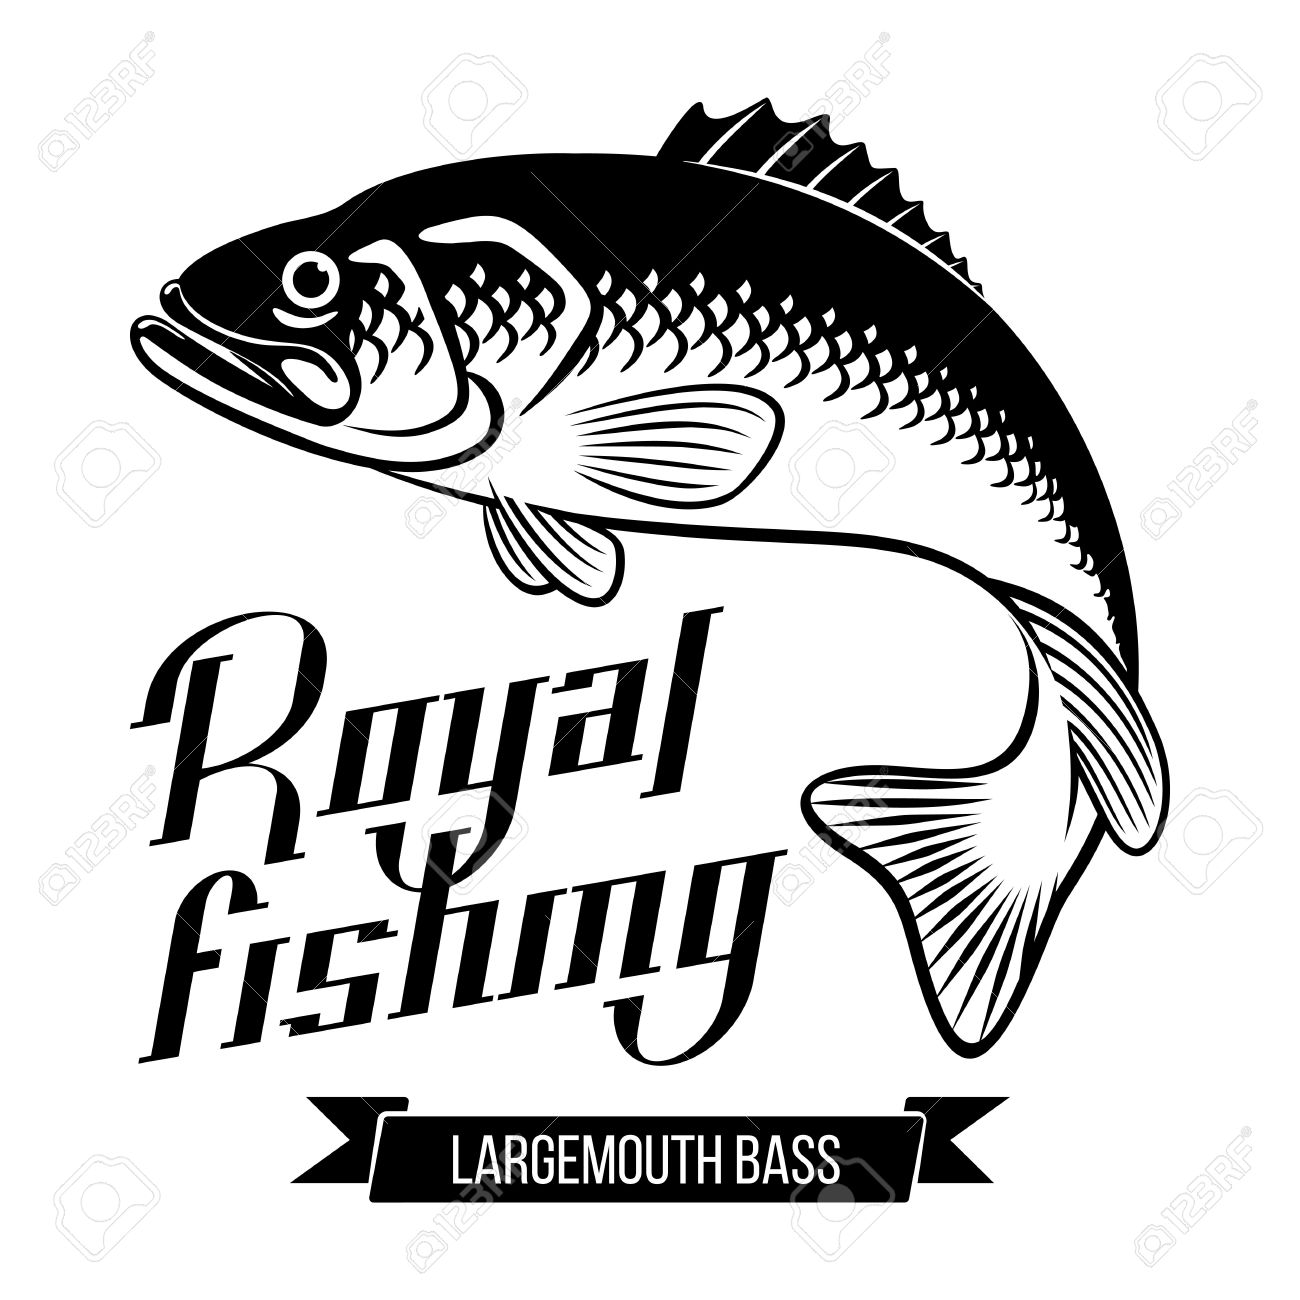 1300x1300 Largemouth Bass. Fish Vector Illustration. Royal Fishing